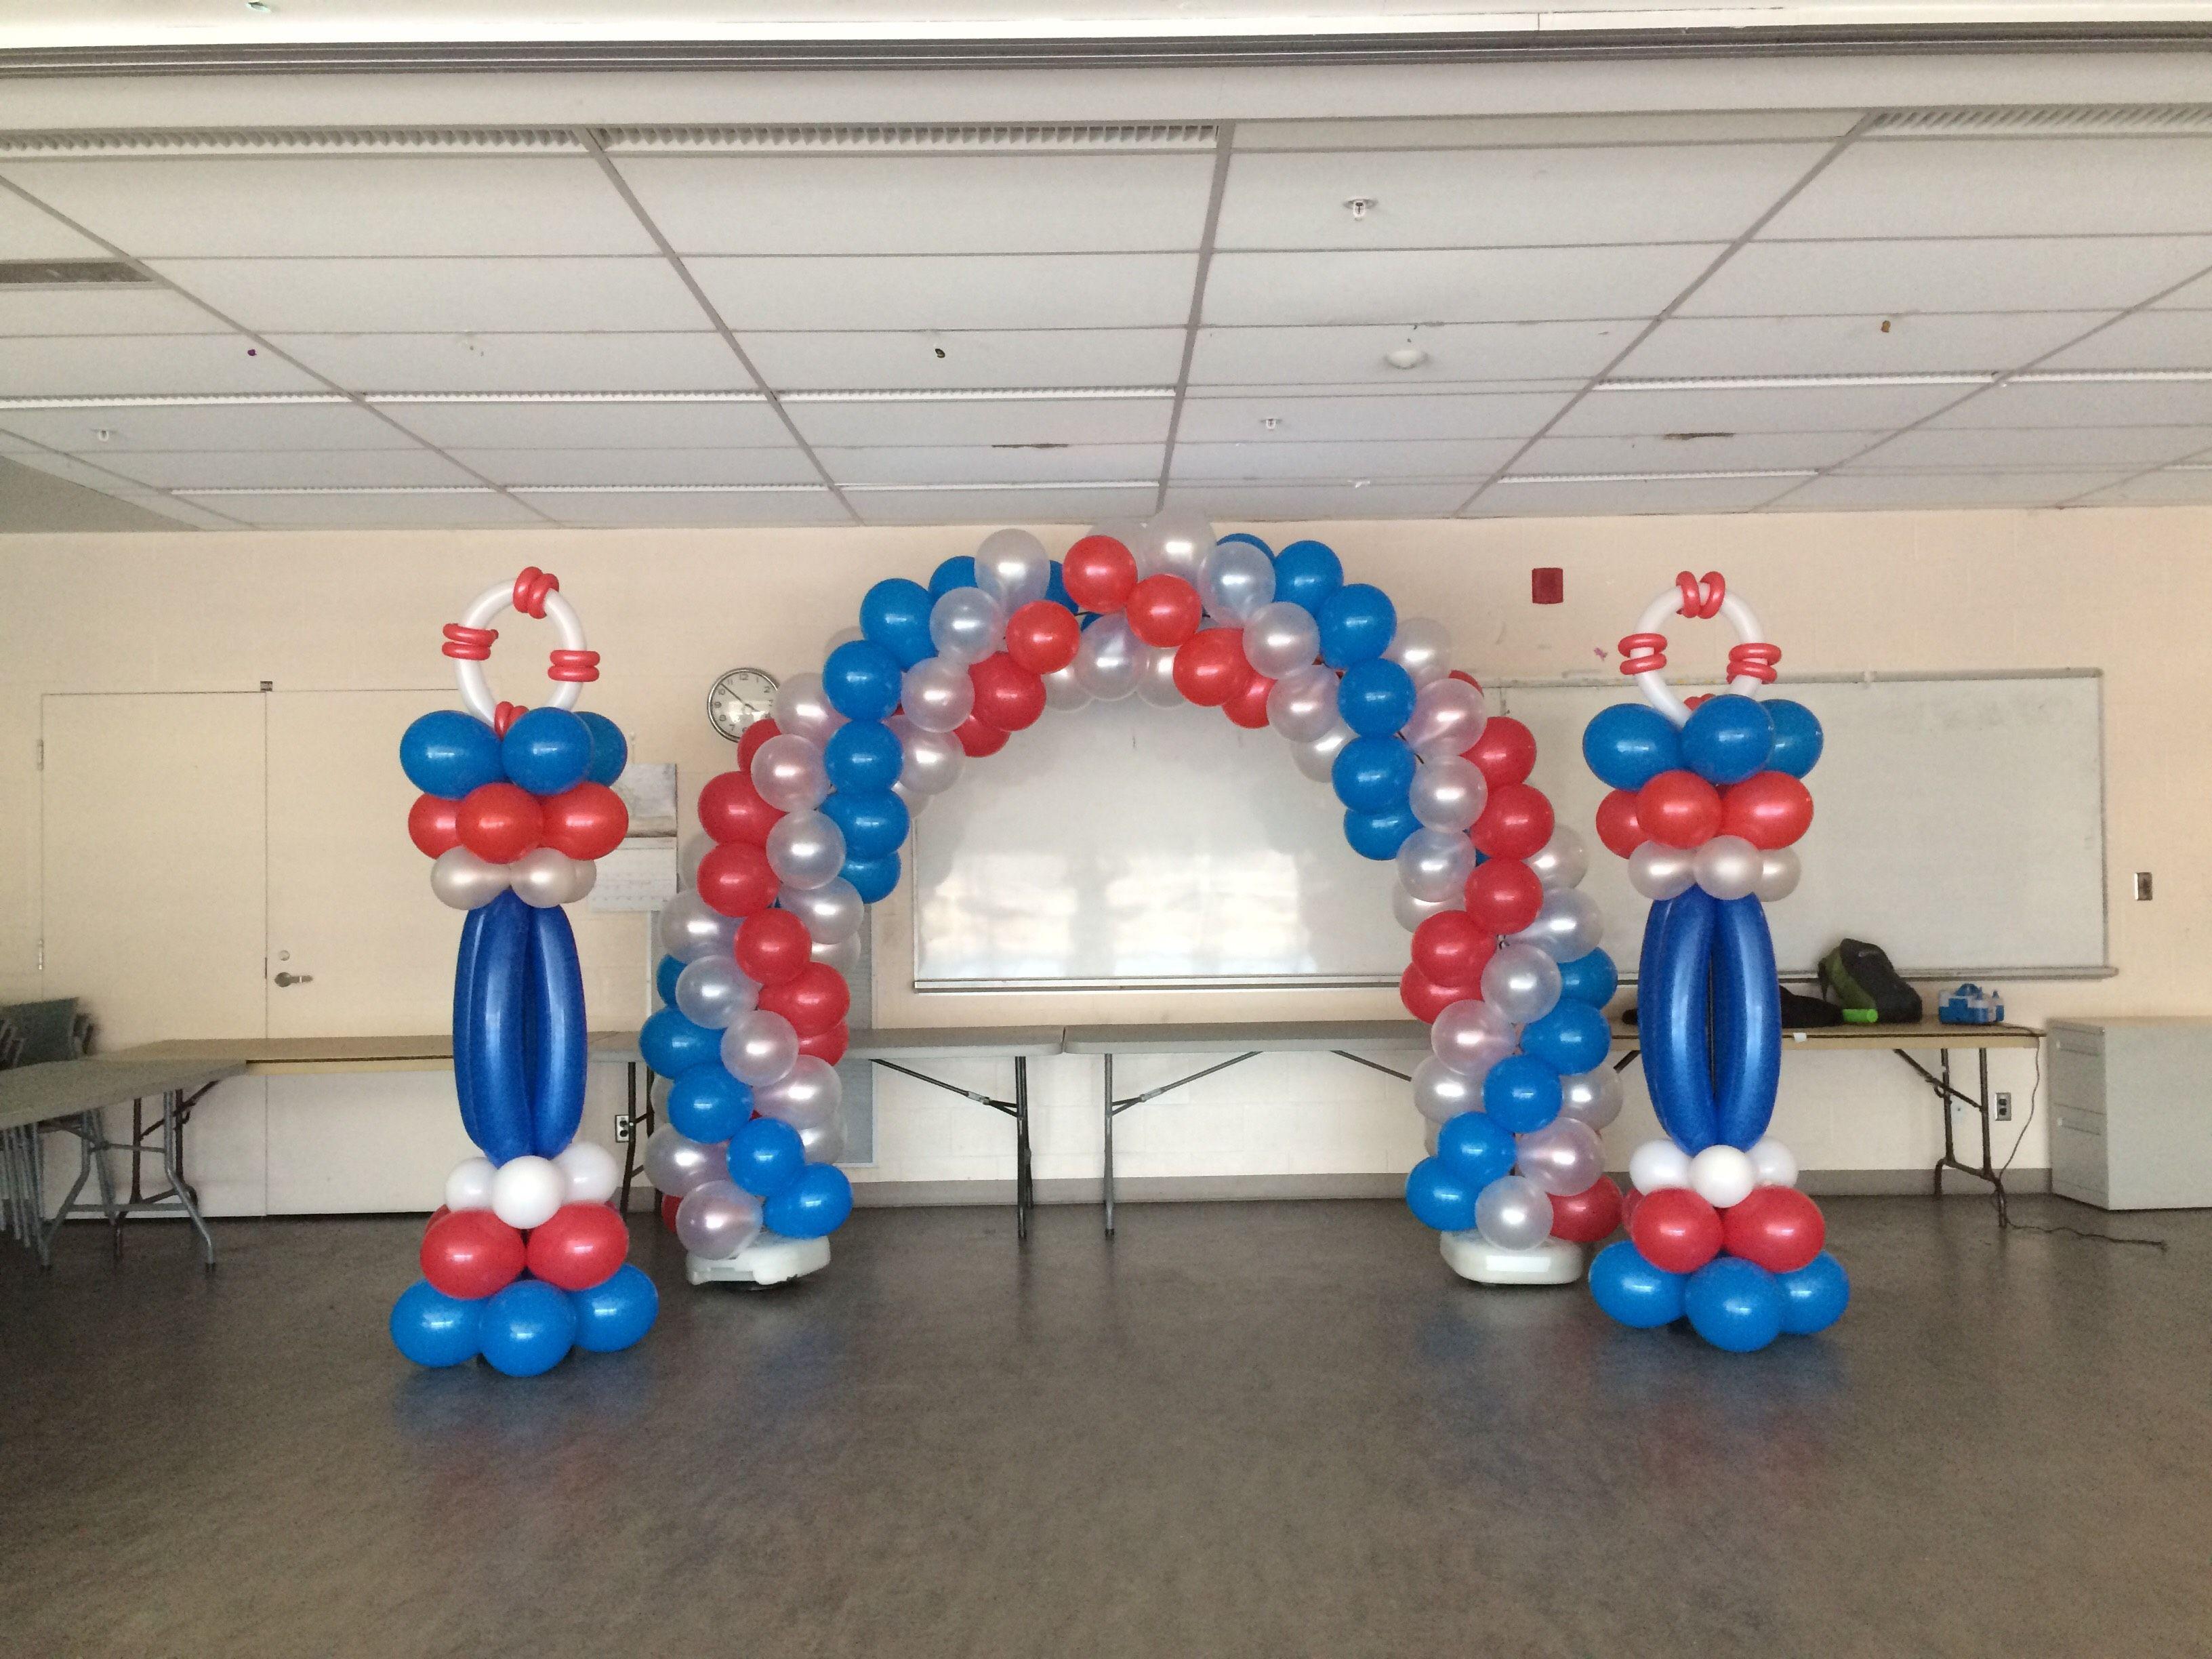 An Anchors Sailing Themed Balloon Arch And 2 Columns Set Up